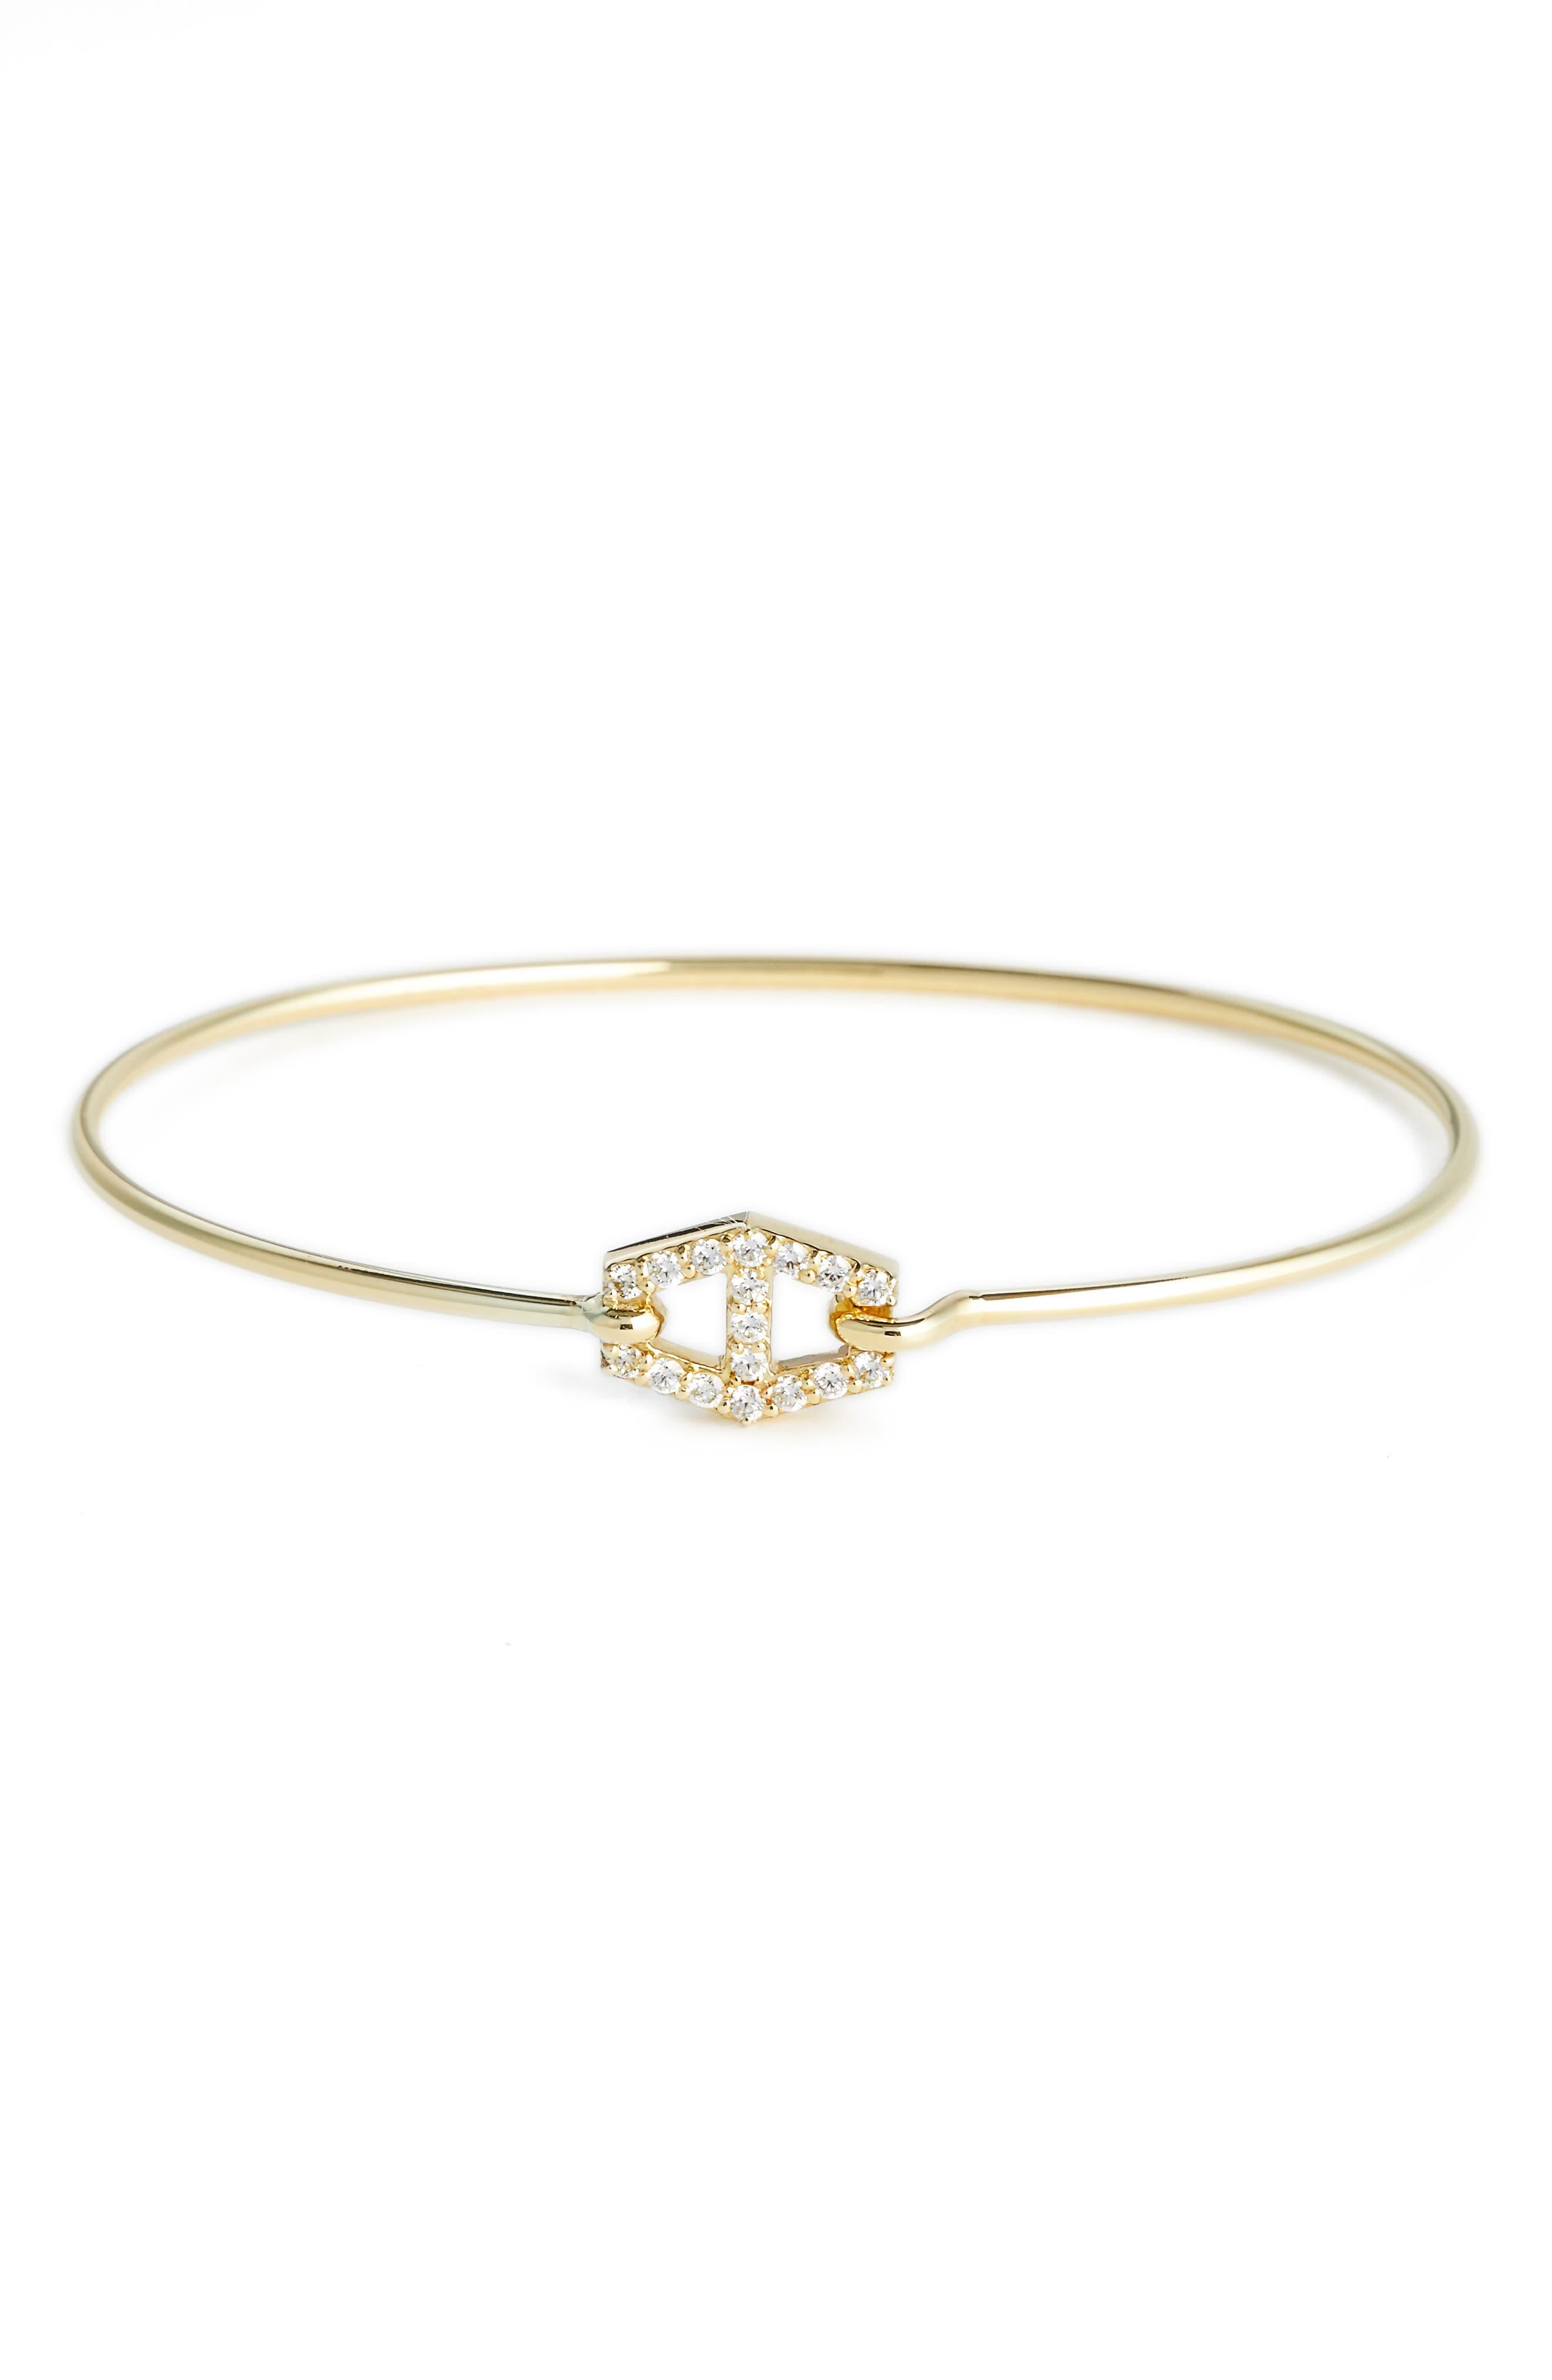 Alternate Image 1 Selected - Jemma Wynne Prive Diamond Bangle